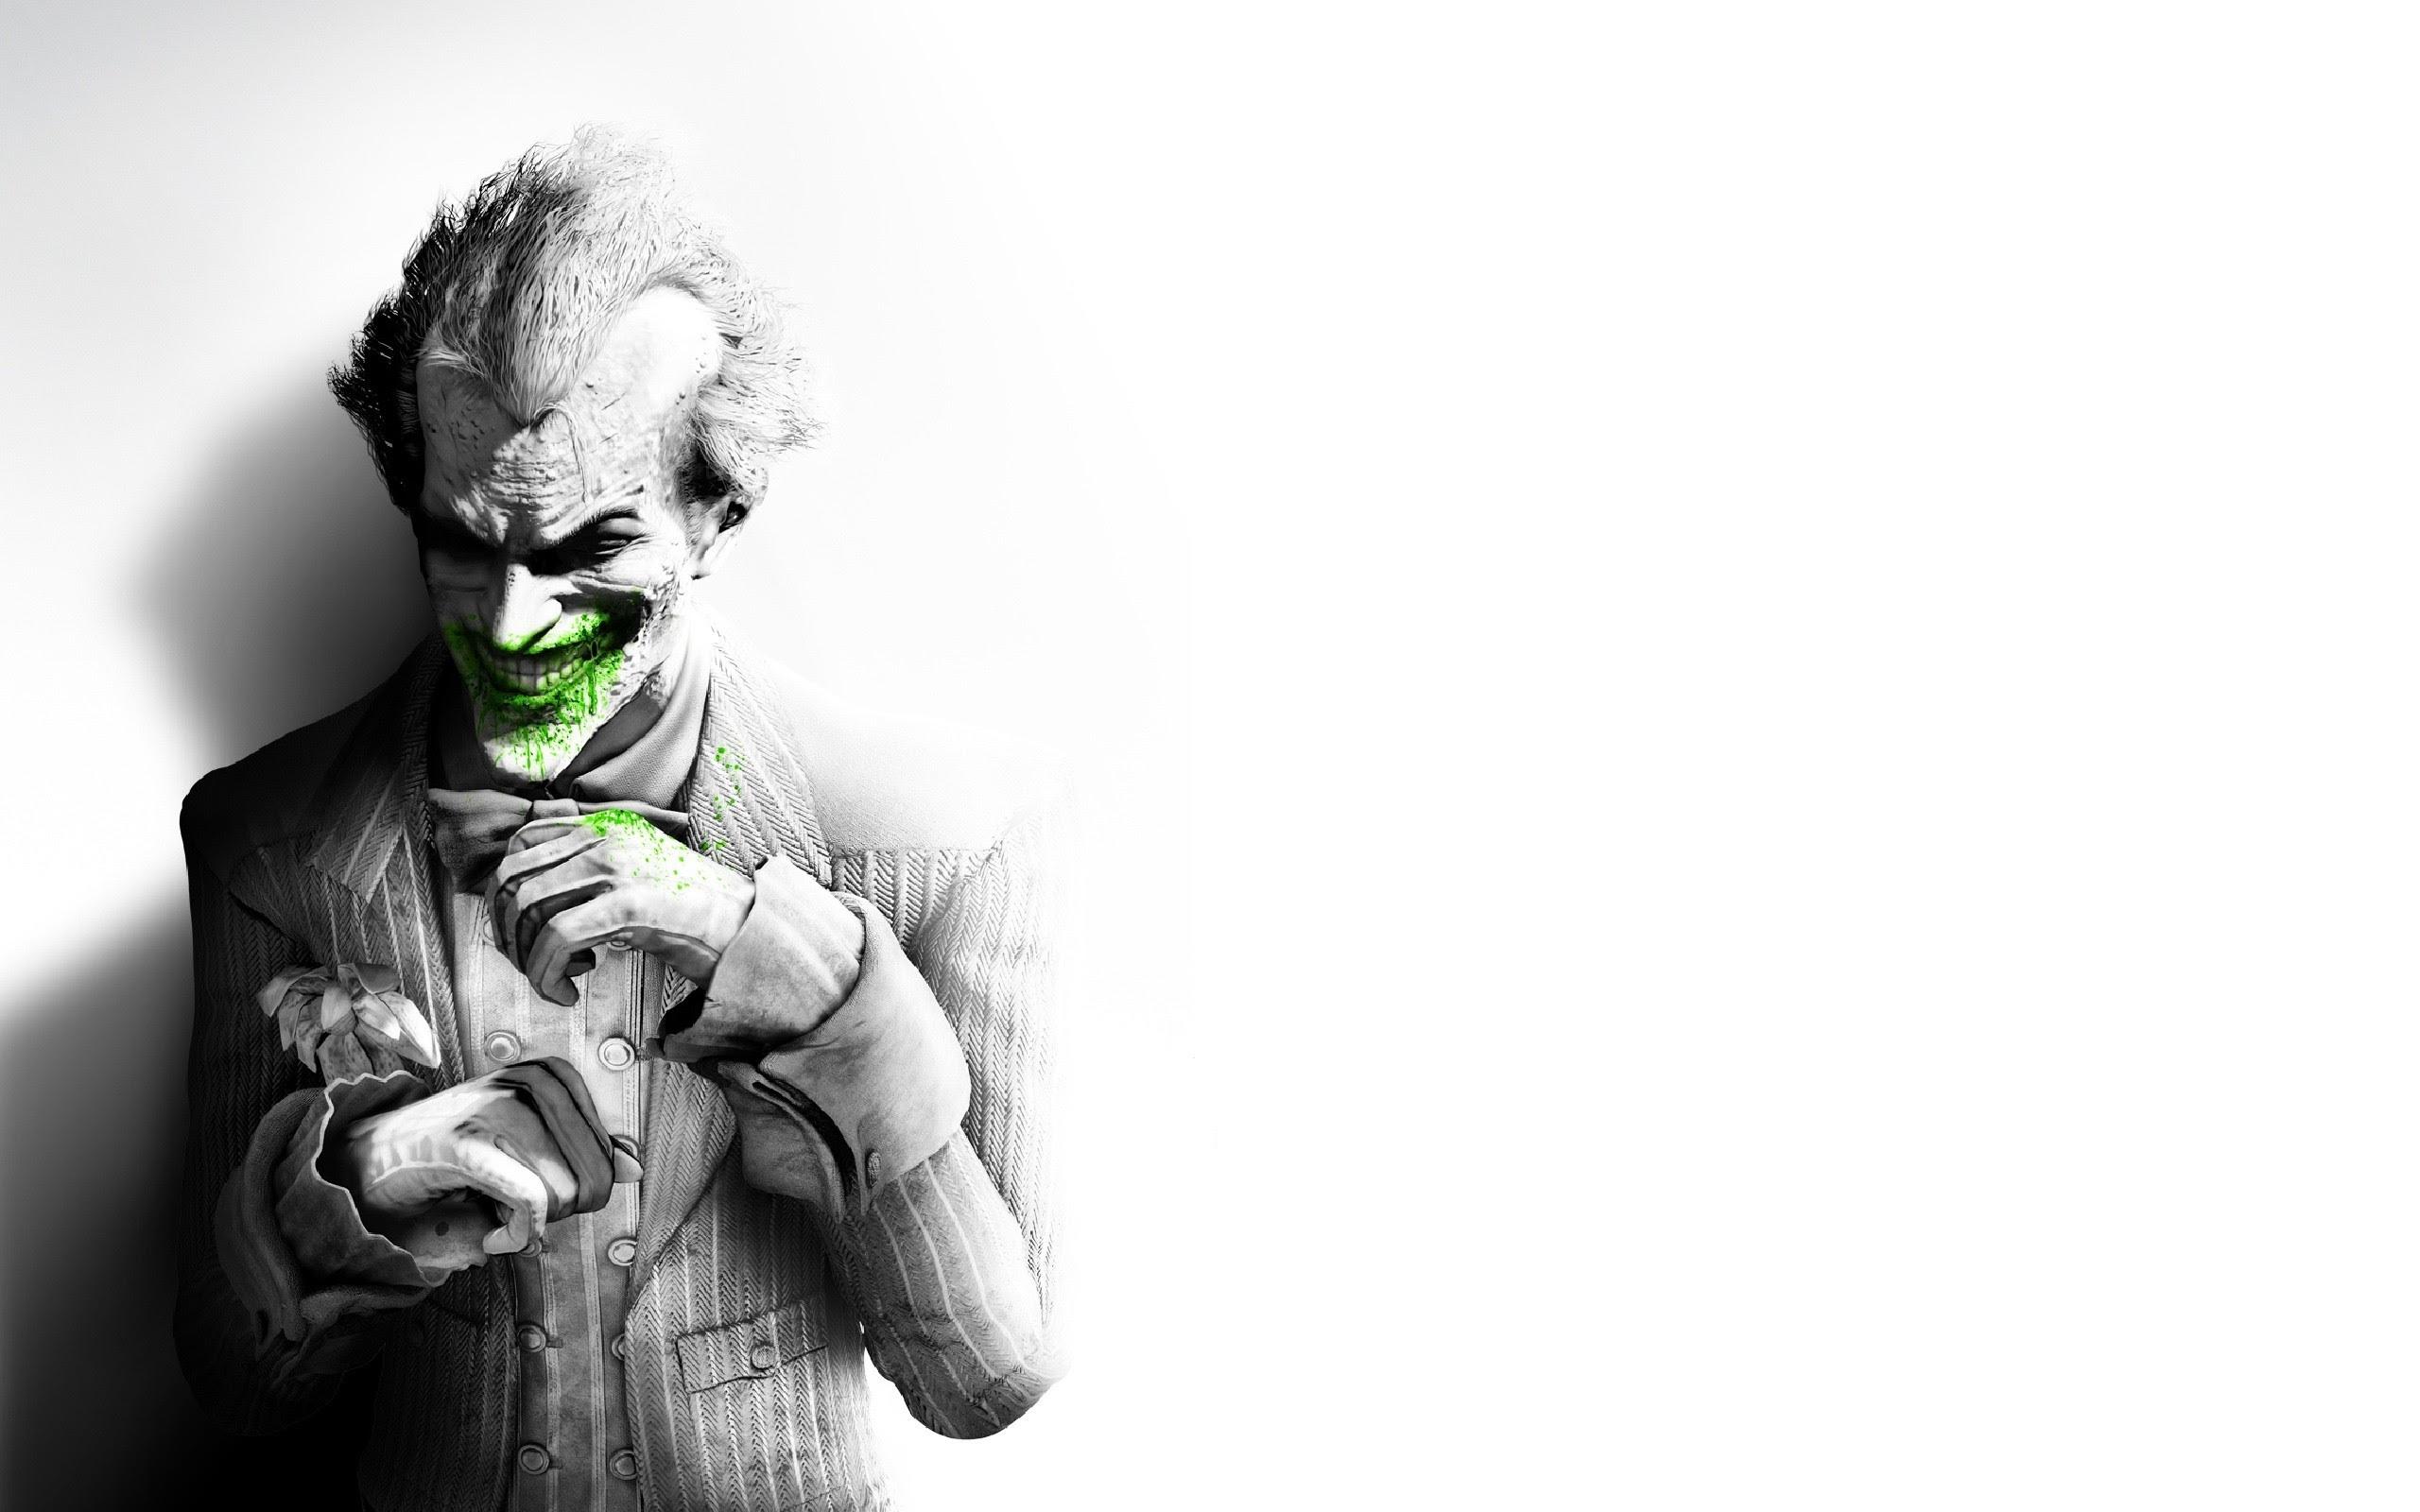 Batman Arkham City Joker Smile Suit Flower Fan Art Black And